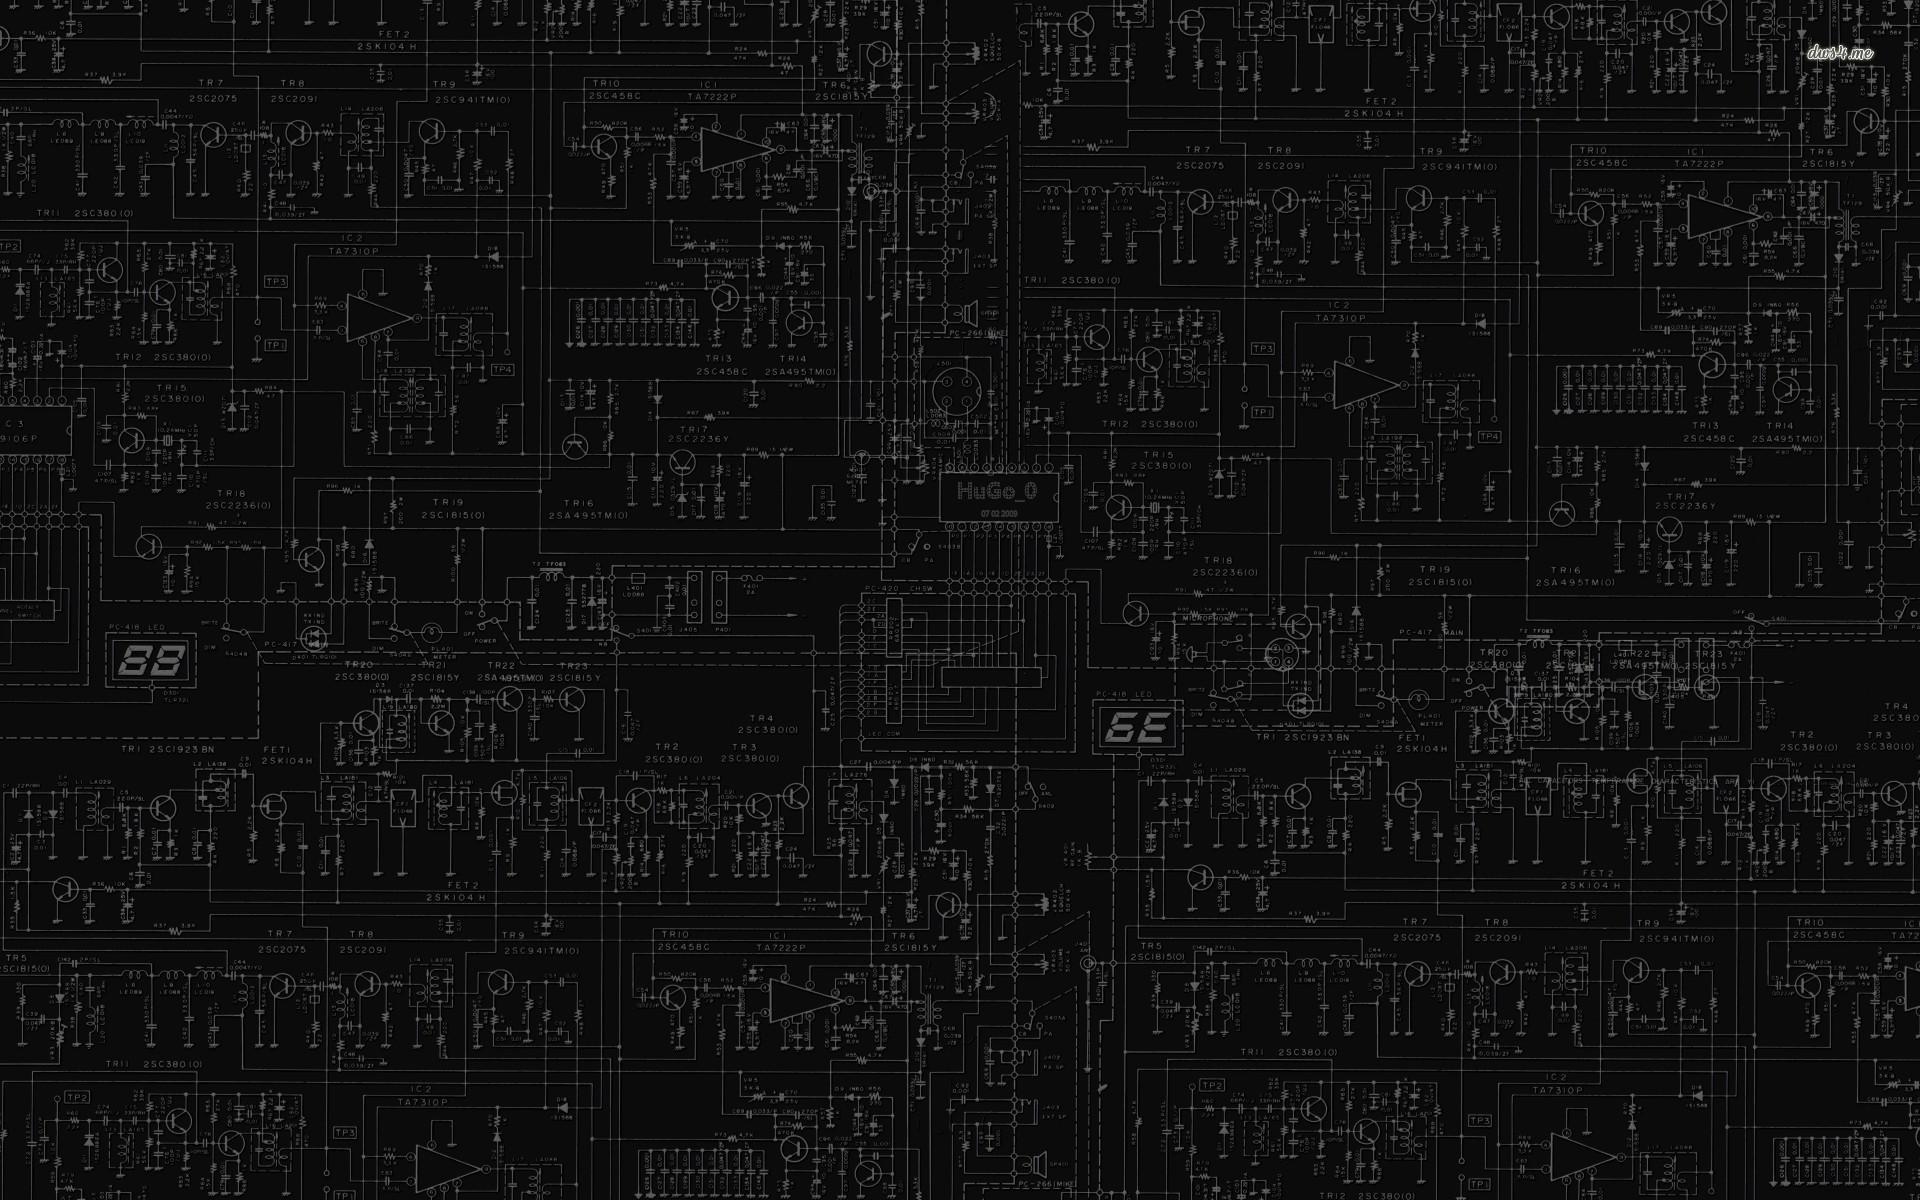 circuit diagram wallpaper wallpaper wide hd just wire \u2022 wiring diagram symbols circuit board wallpaper wide wallpaper collections 1920x1200 rh avante biz hd marvel wallpapers for desktop best